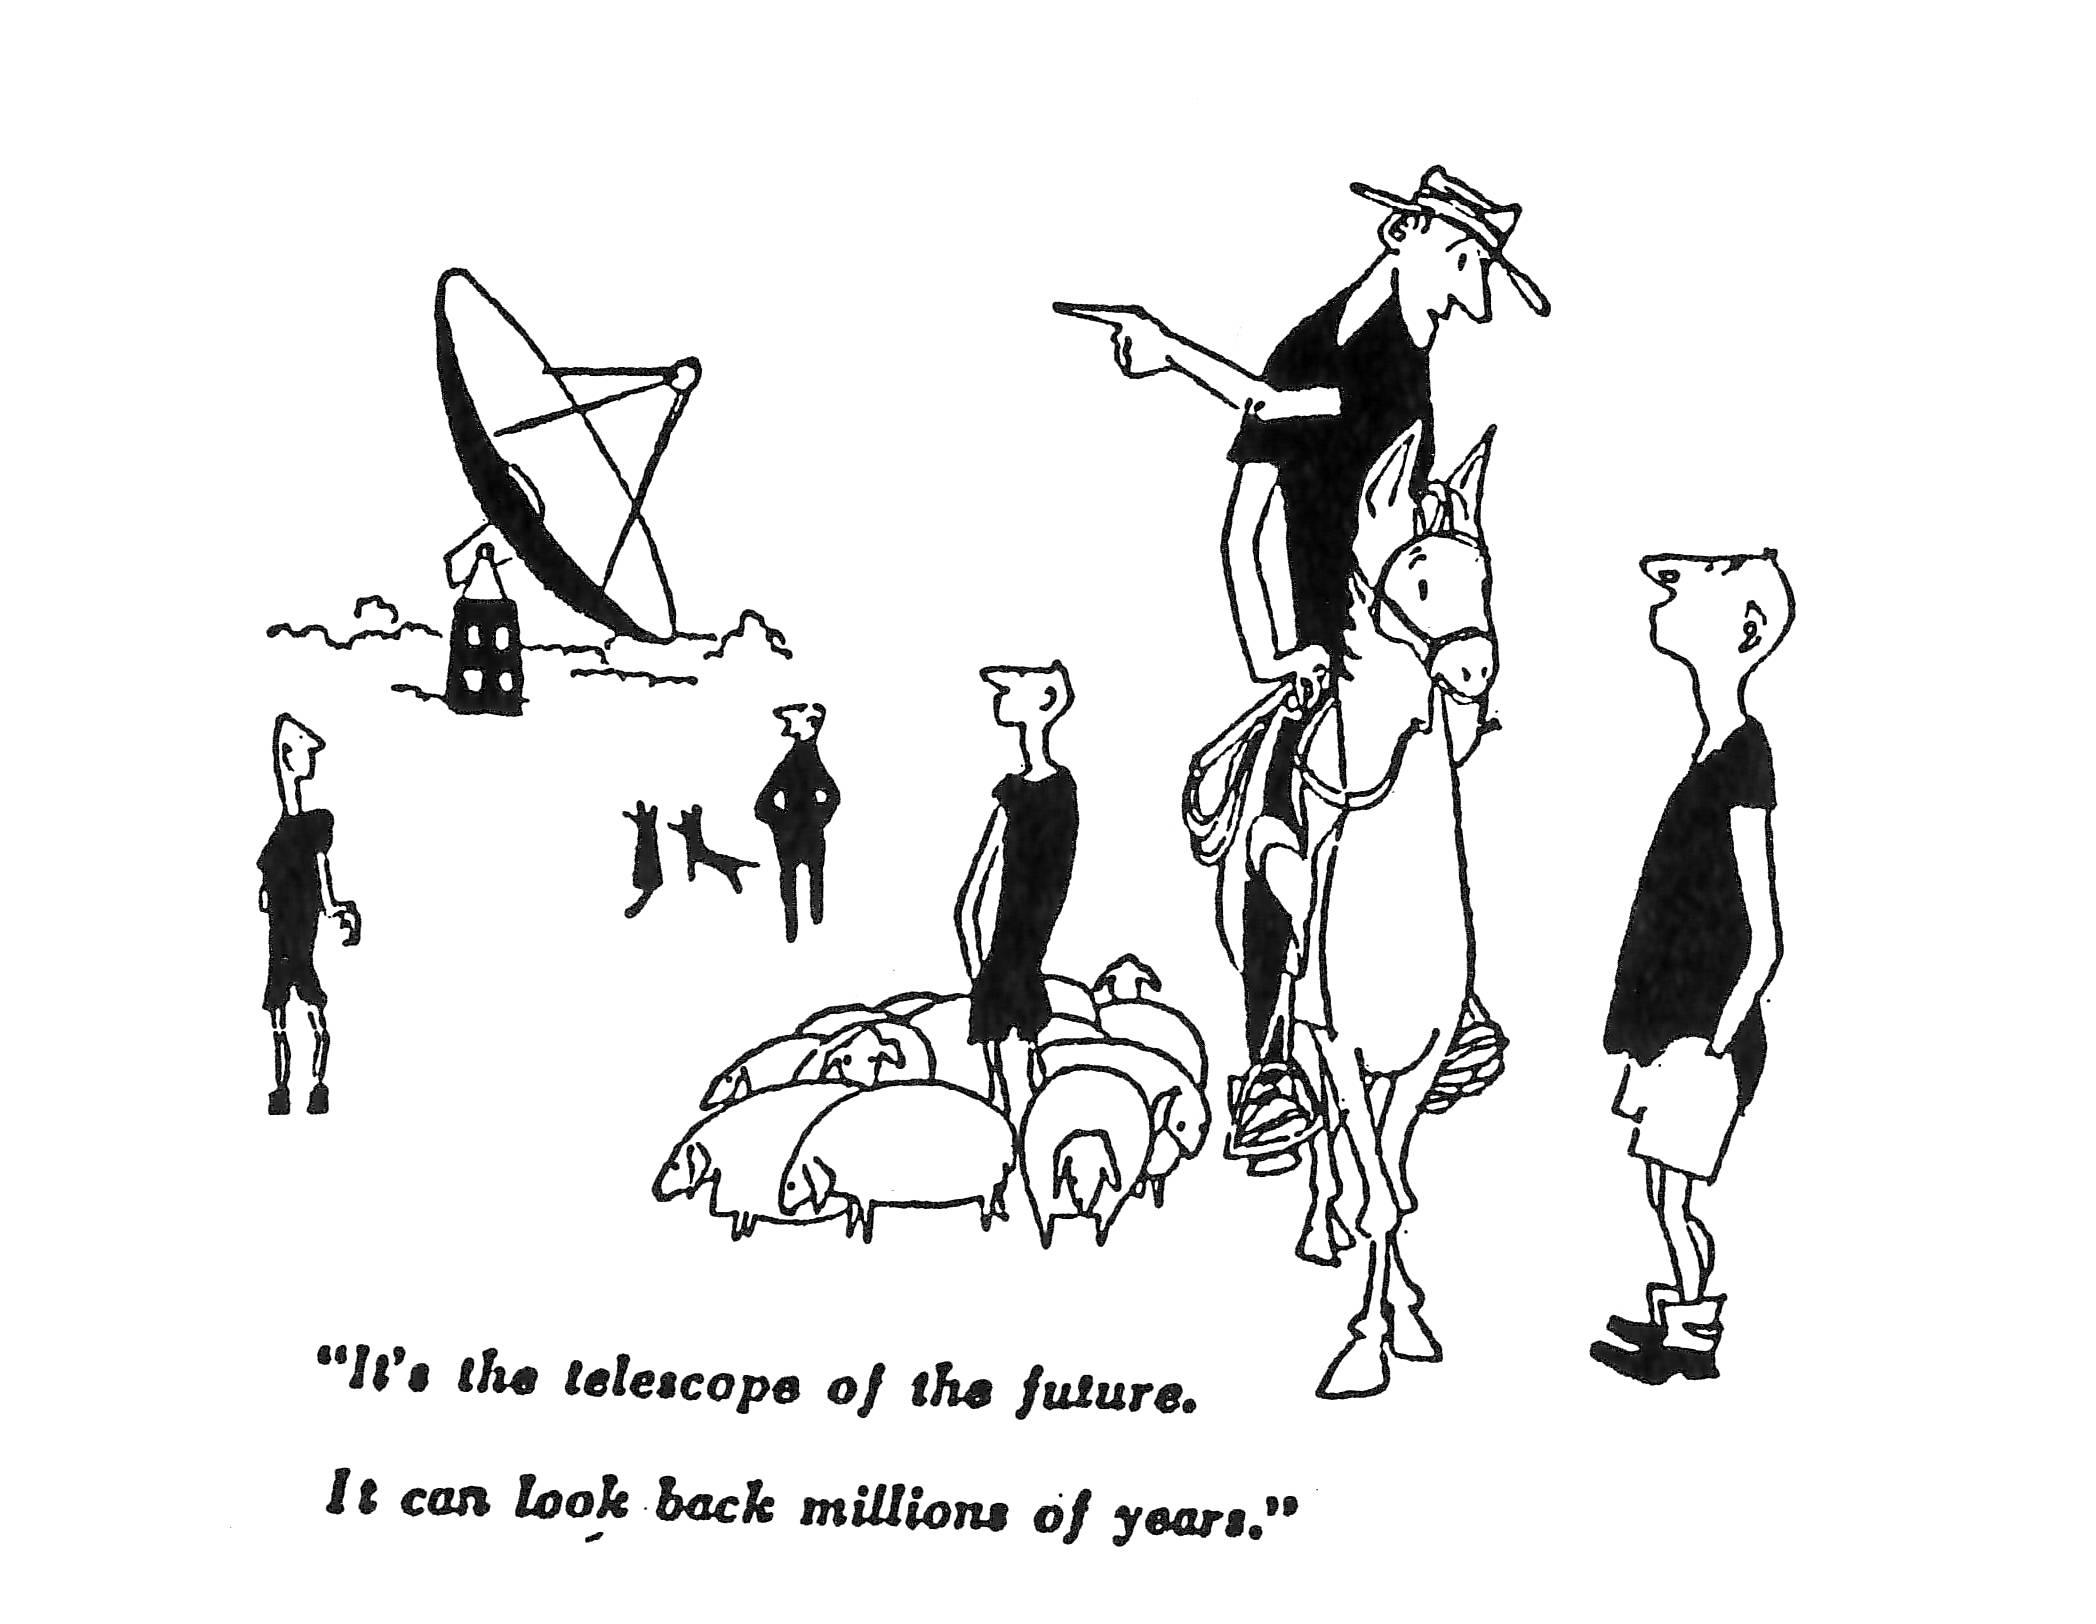 A cartoon by Molnar in the Sydney Morning Herald, November 1961.